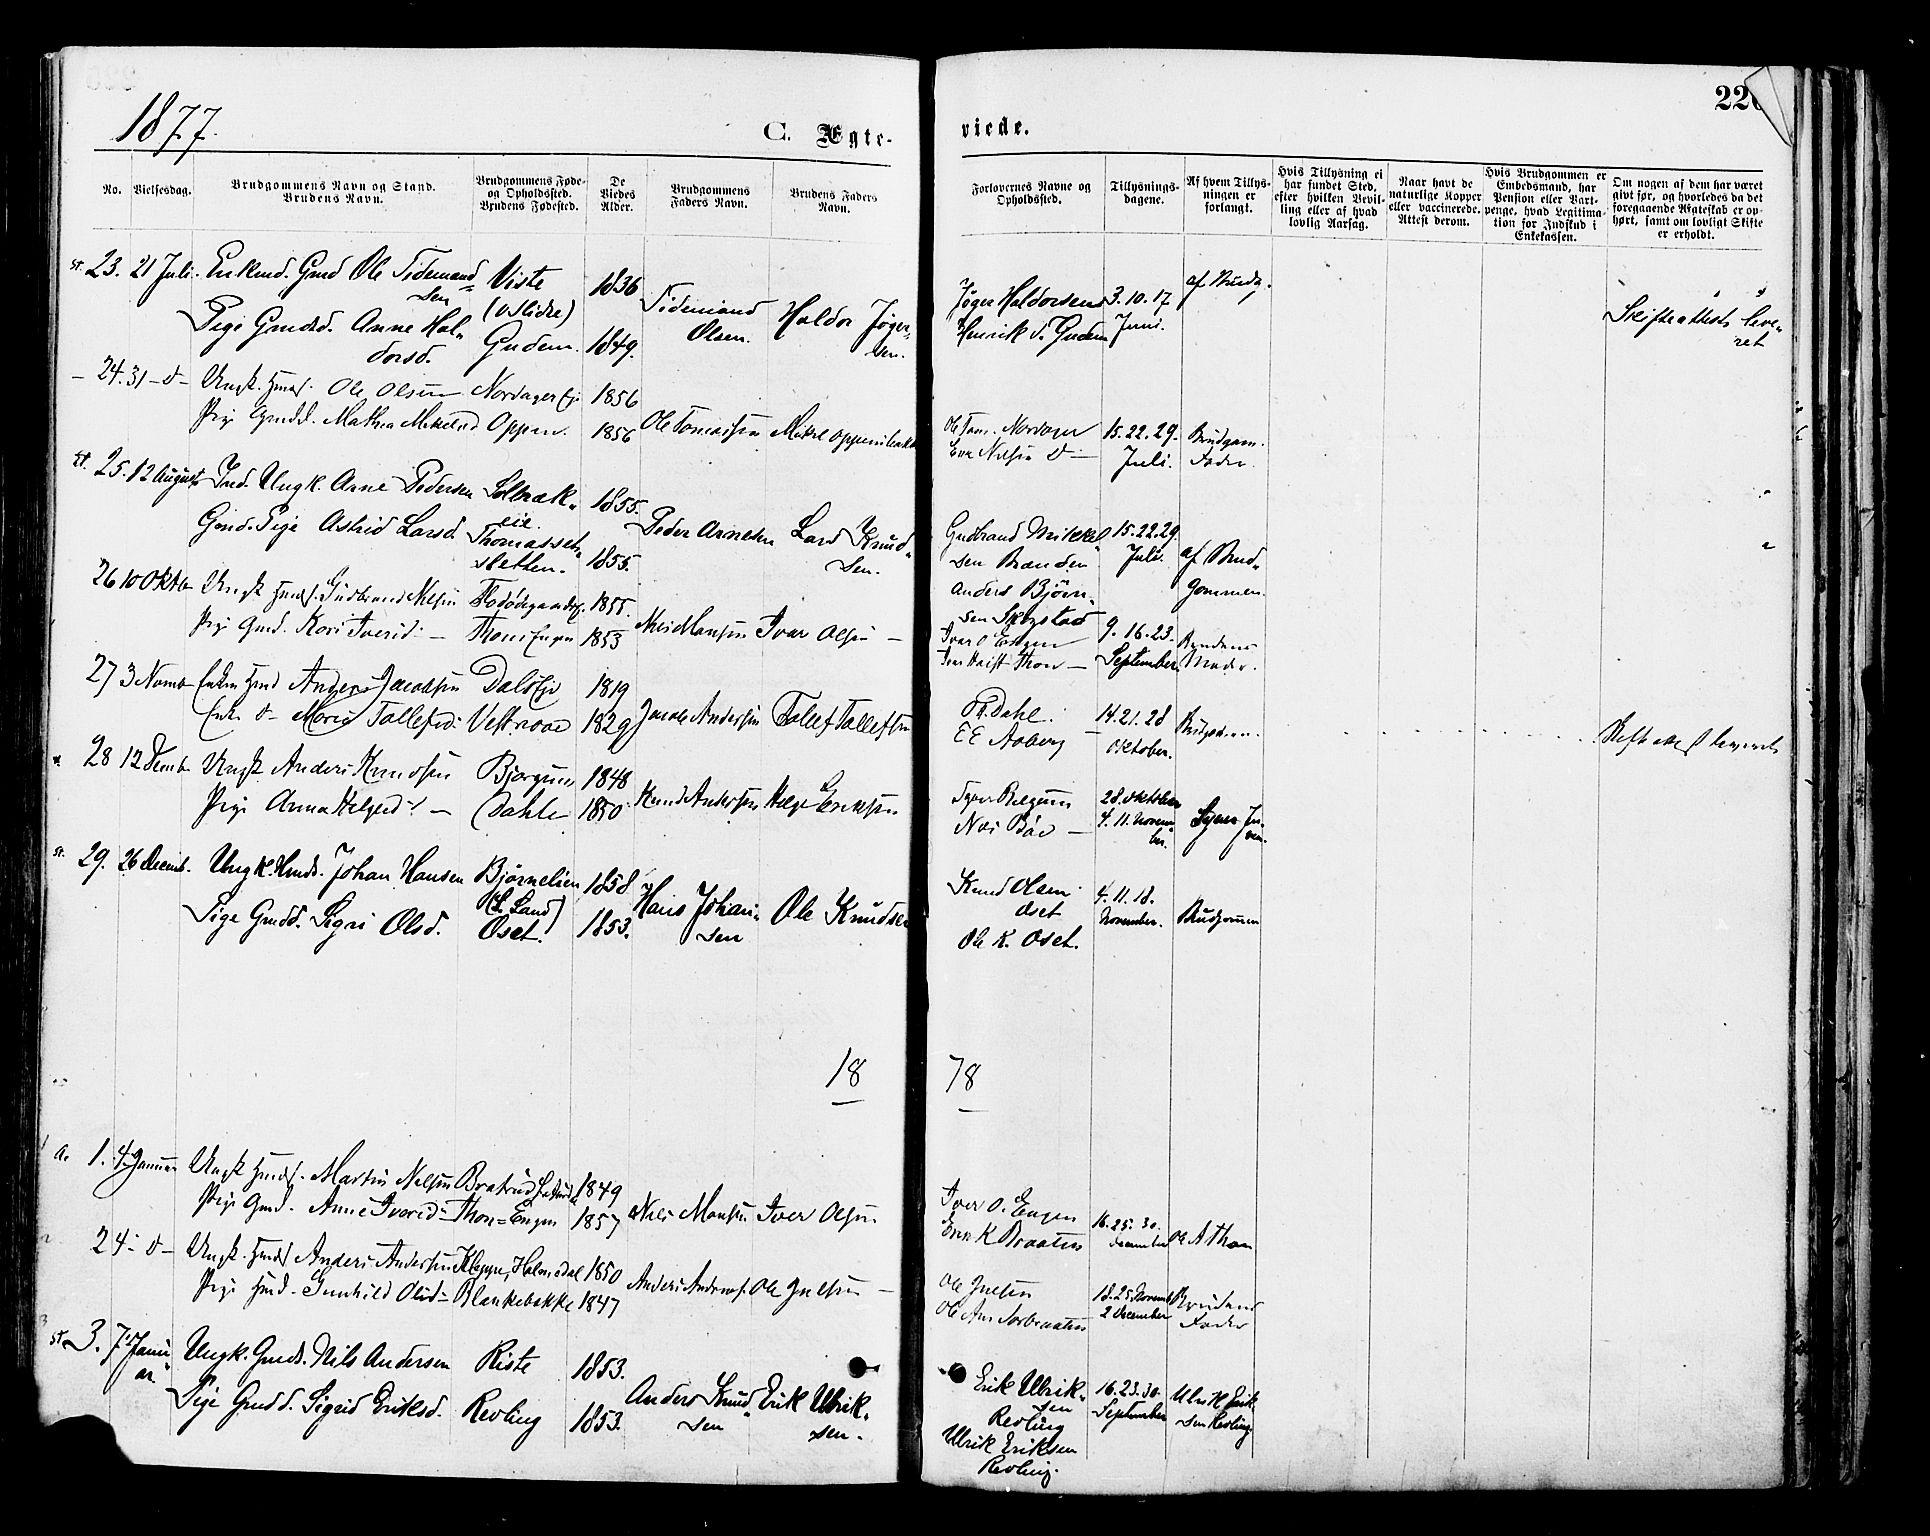 SAH, Nord-Aurdal prestekontor, Ministerialbok nr. 9, 1876-1882, s. 226